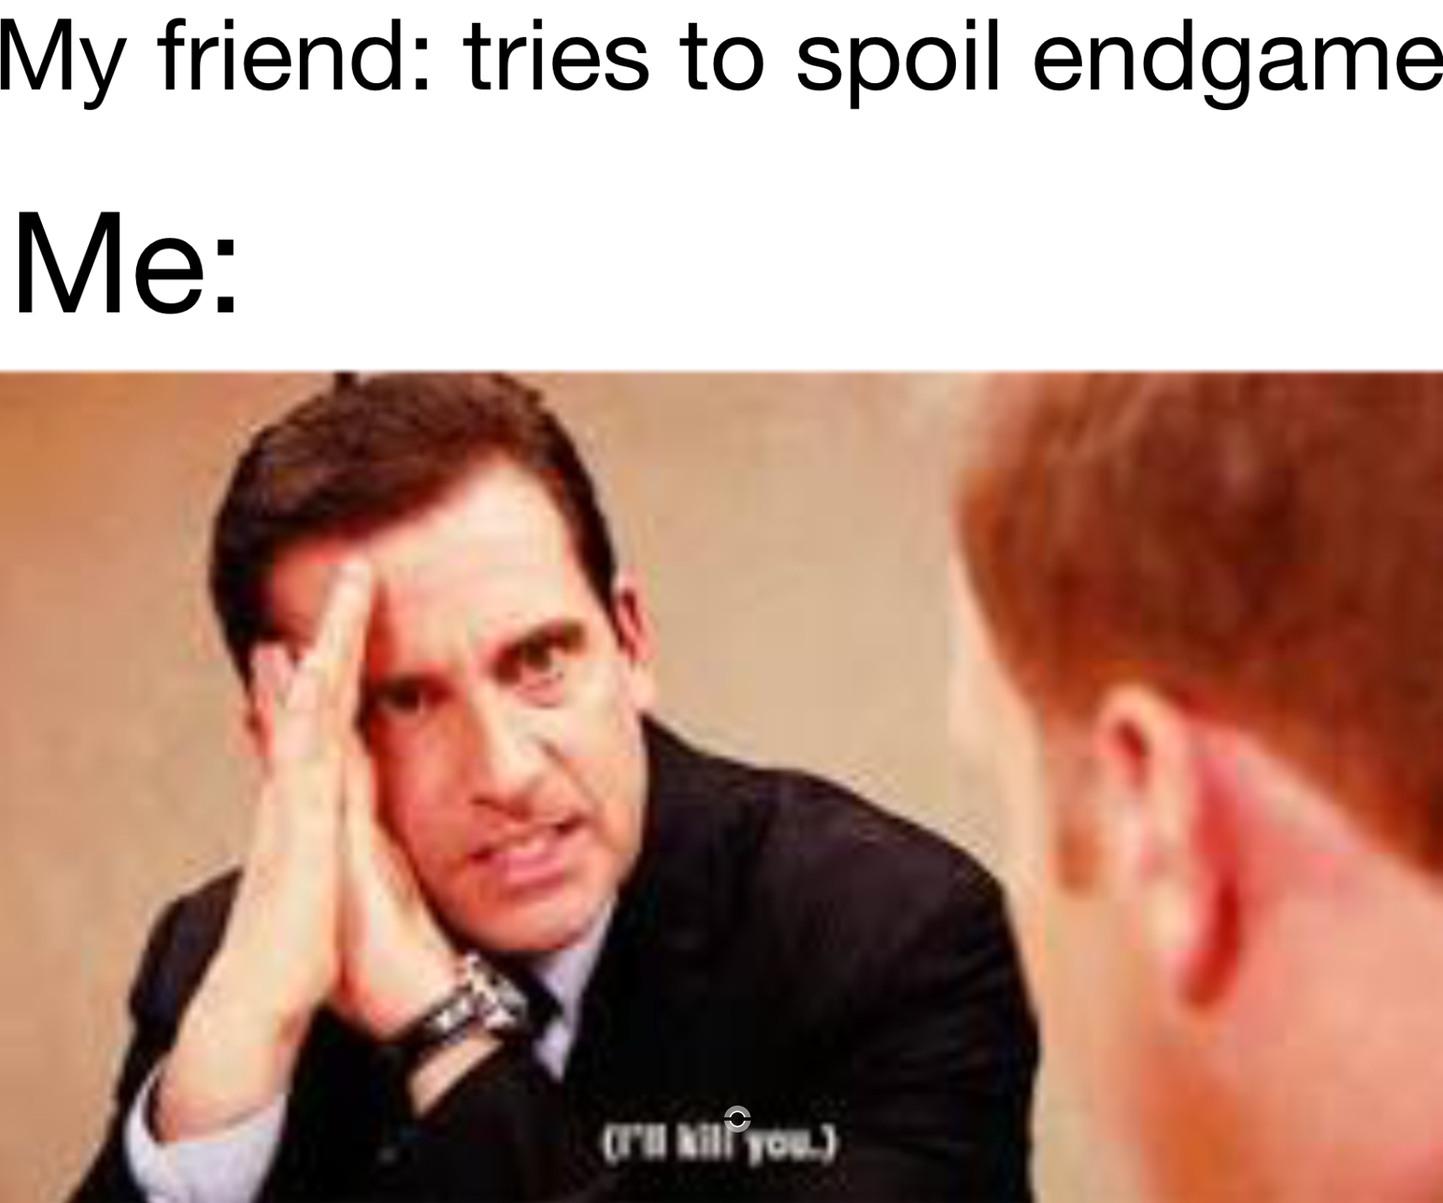 Don't do it   Meme by Kaidecool  Memedroid